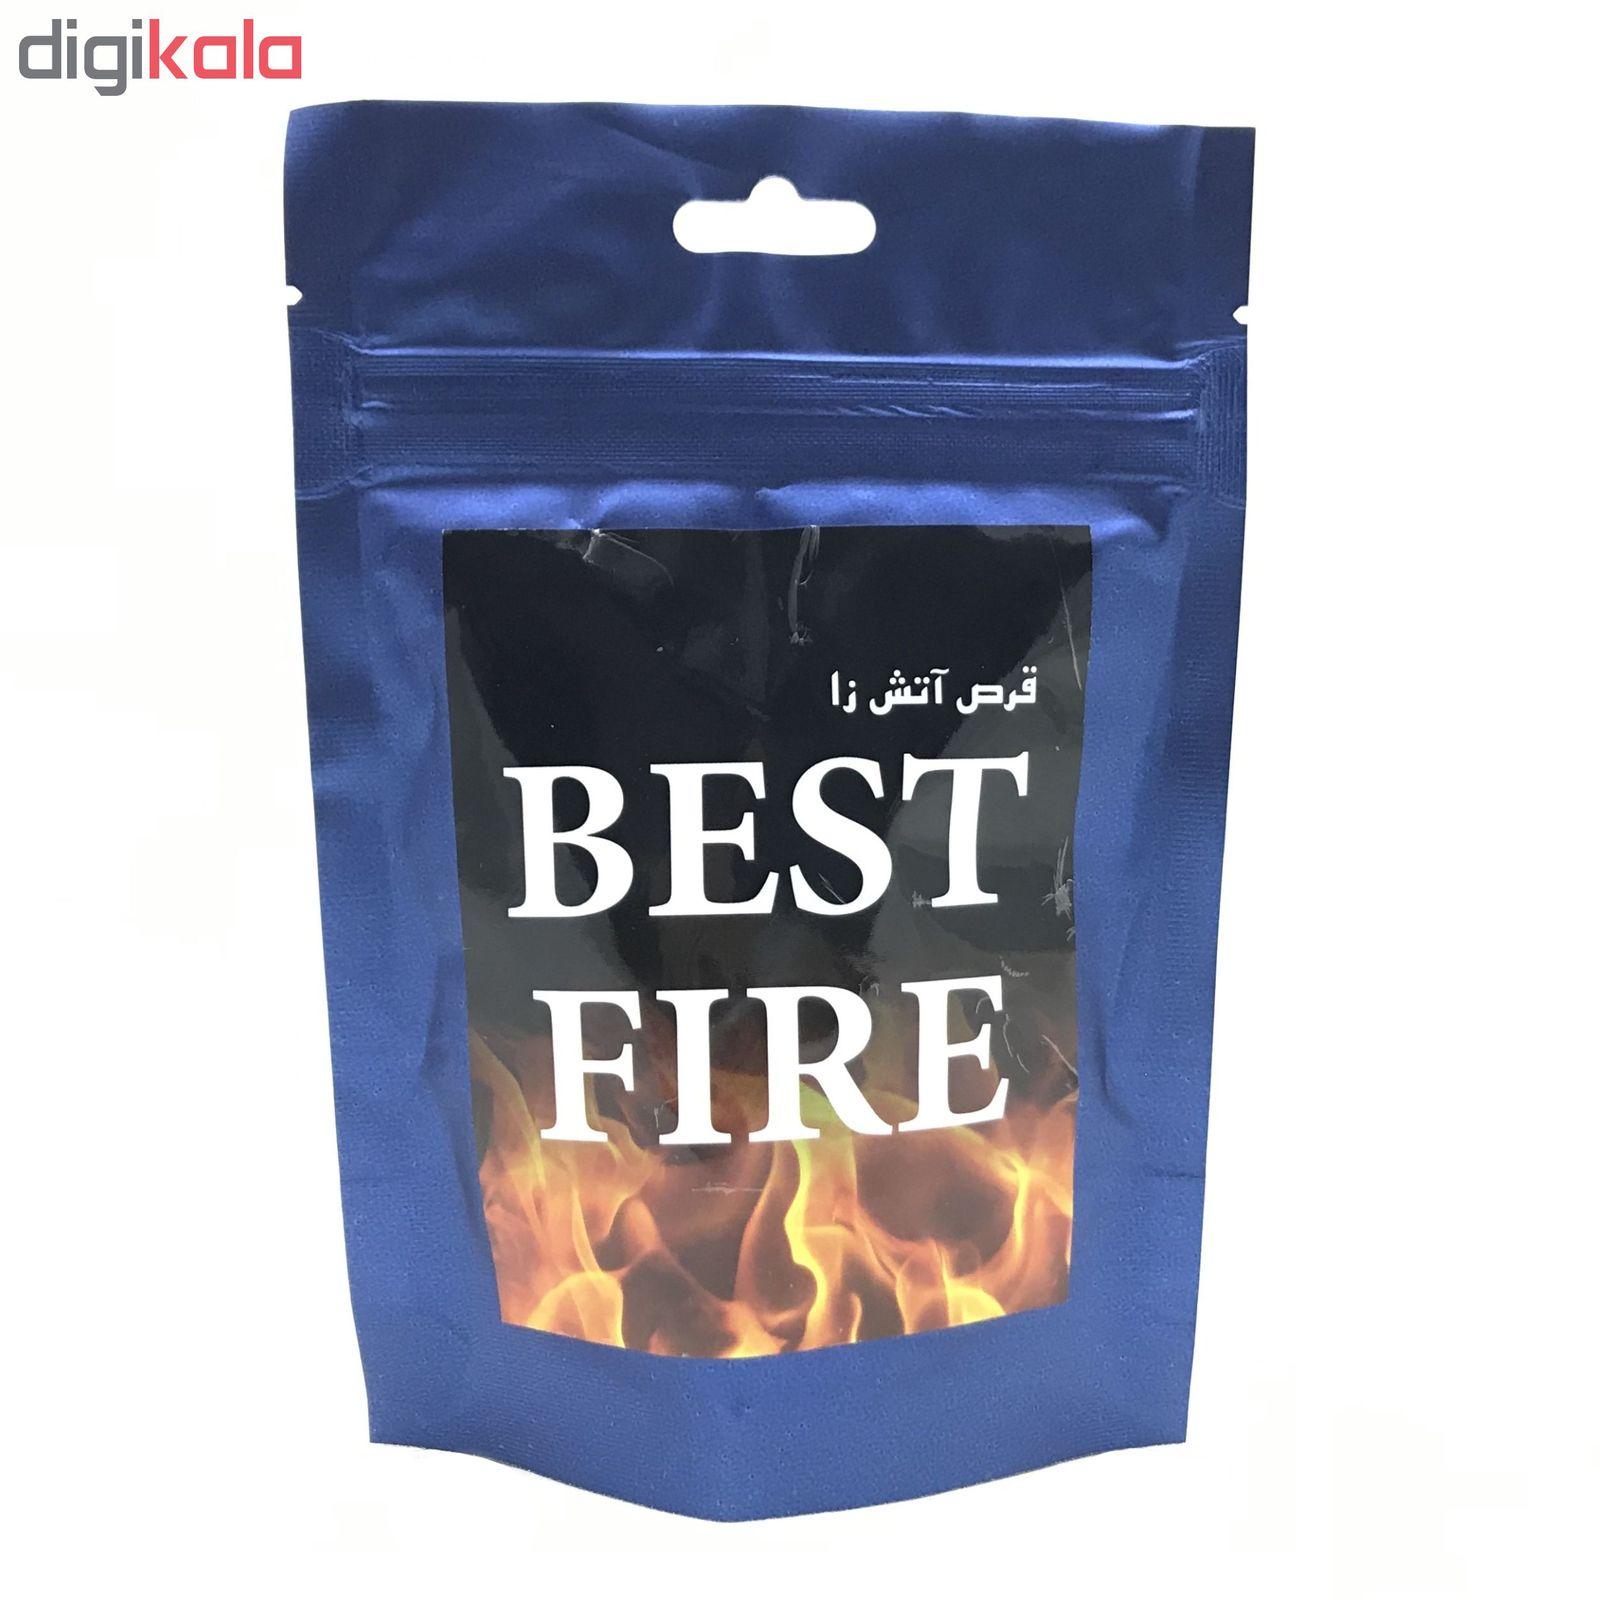 قرص آتش زا مدل BEST FIRE بسته ۳۰ عددی main 1 2